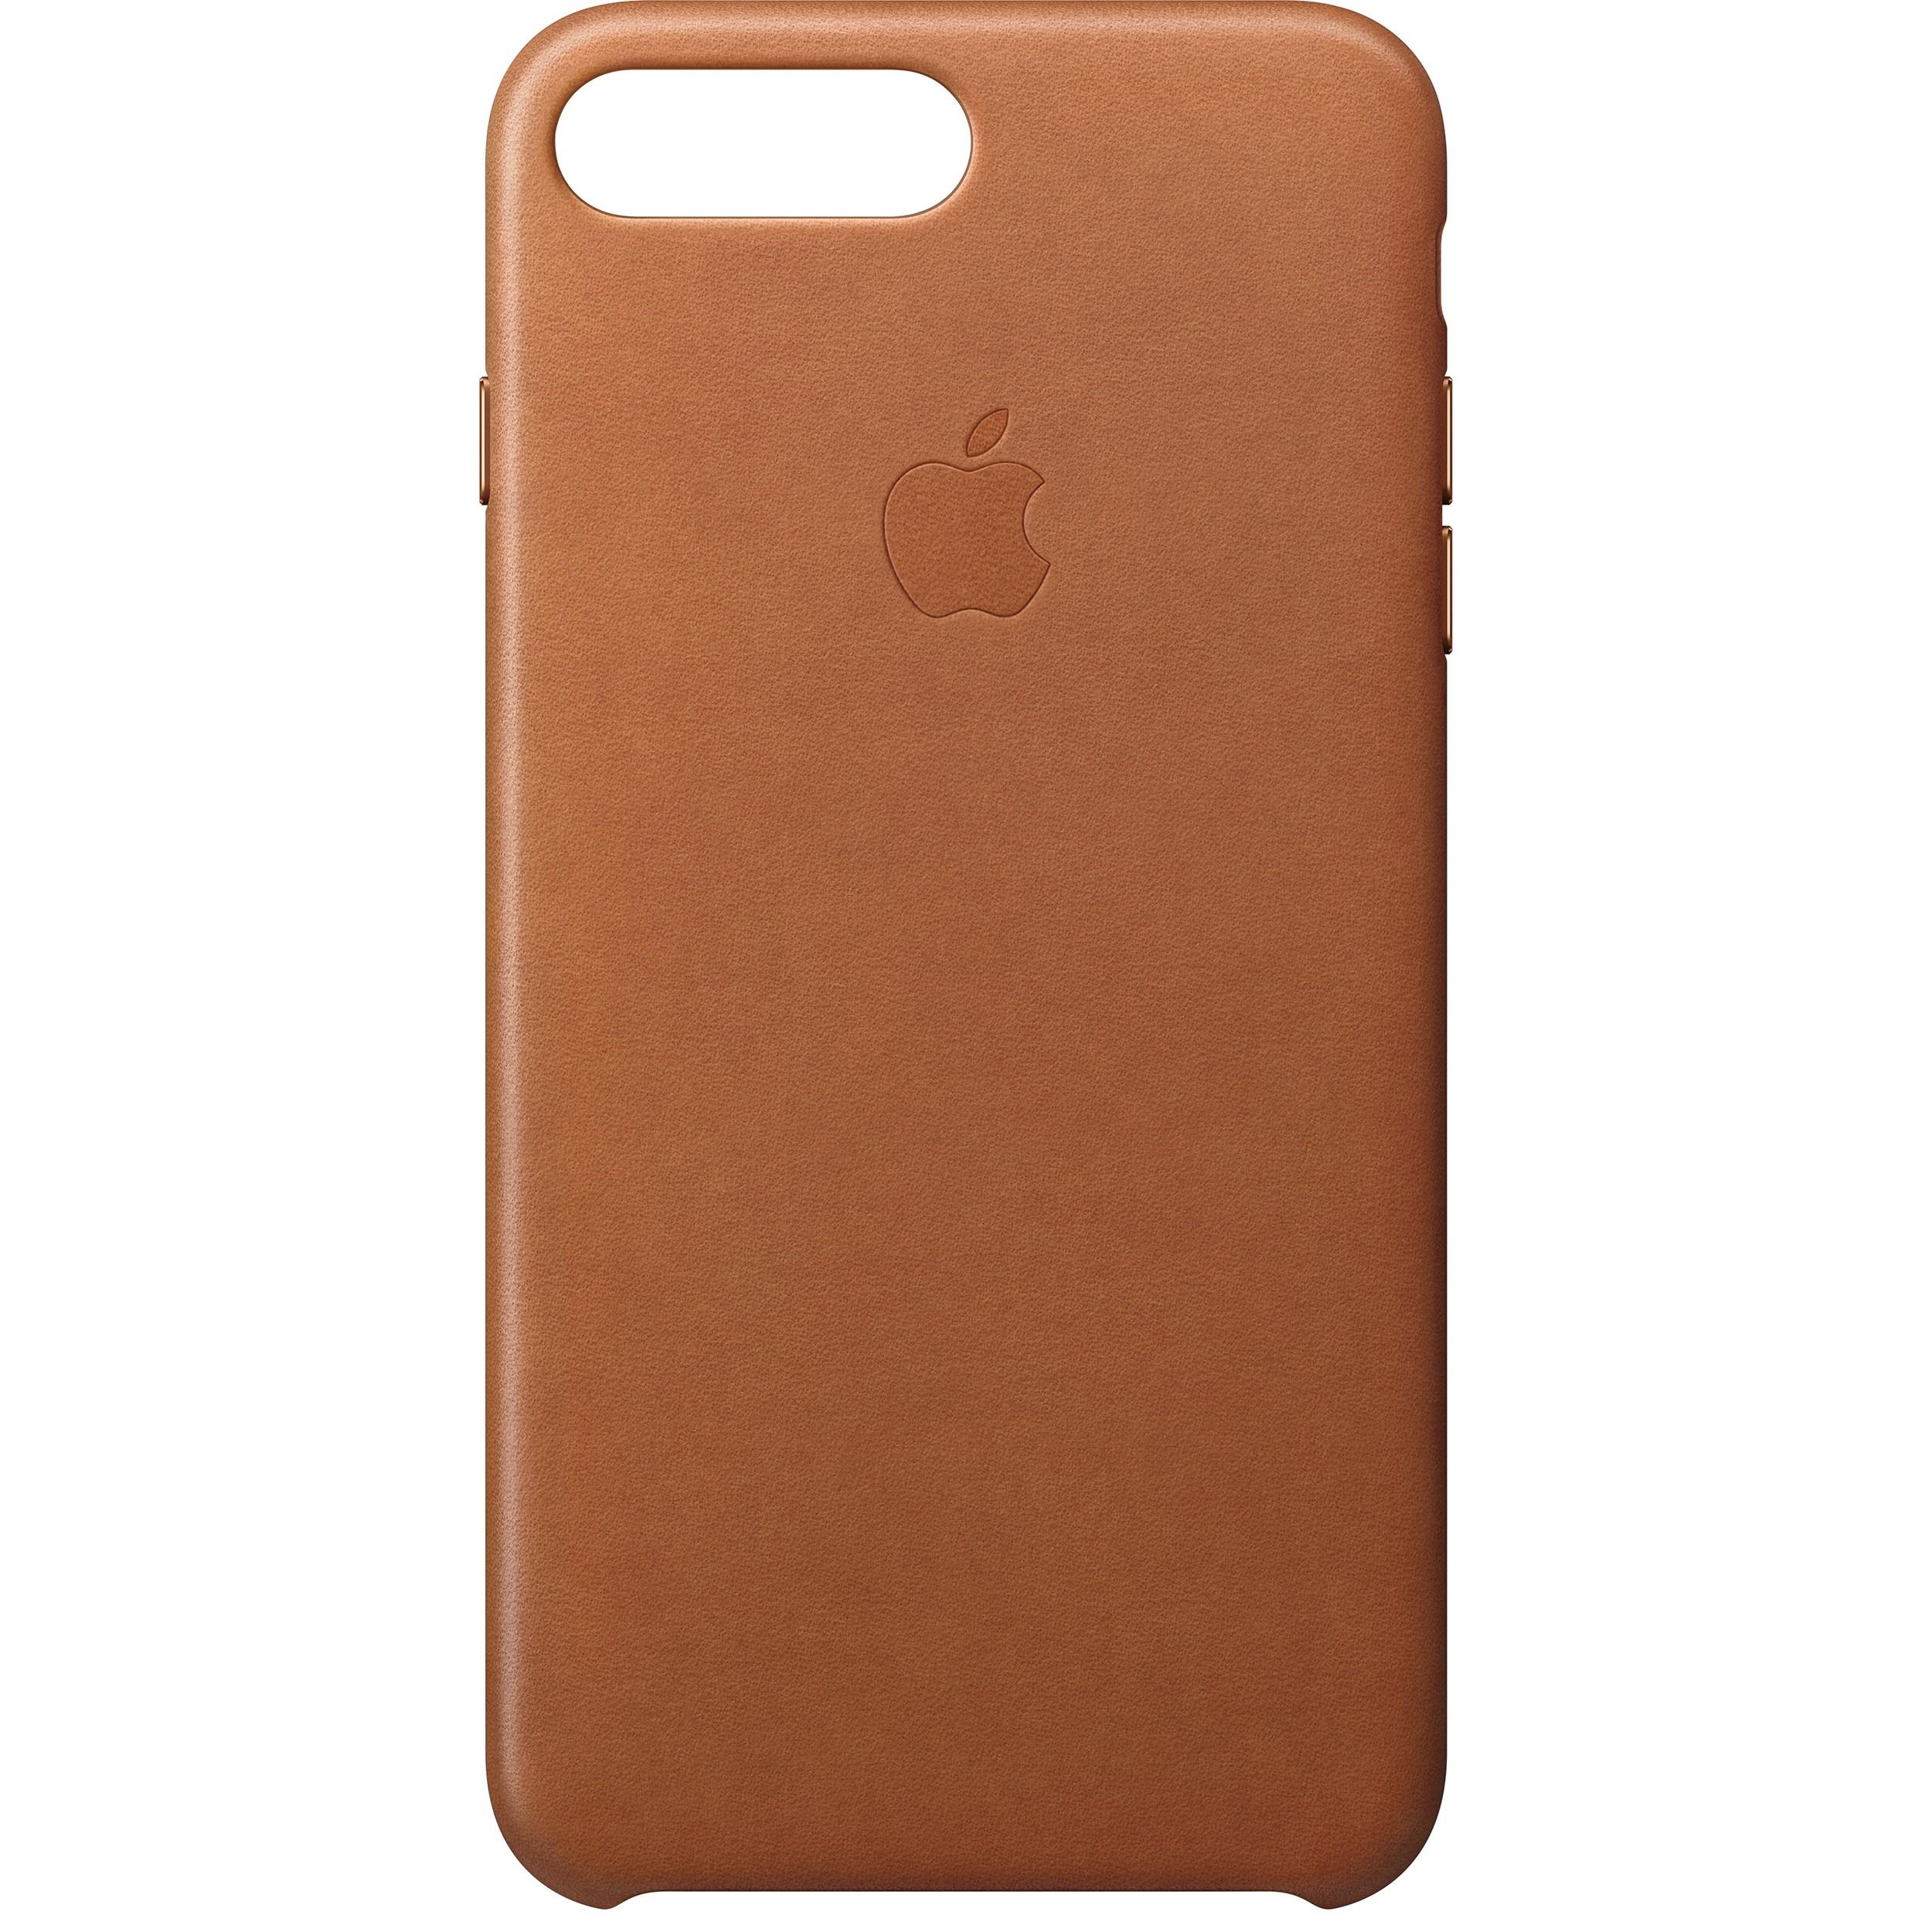 MMYF2ZM/A : Apple iPhone 7 Plus skinndeksel (brun)